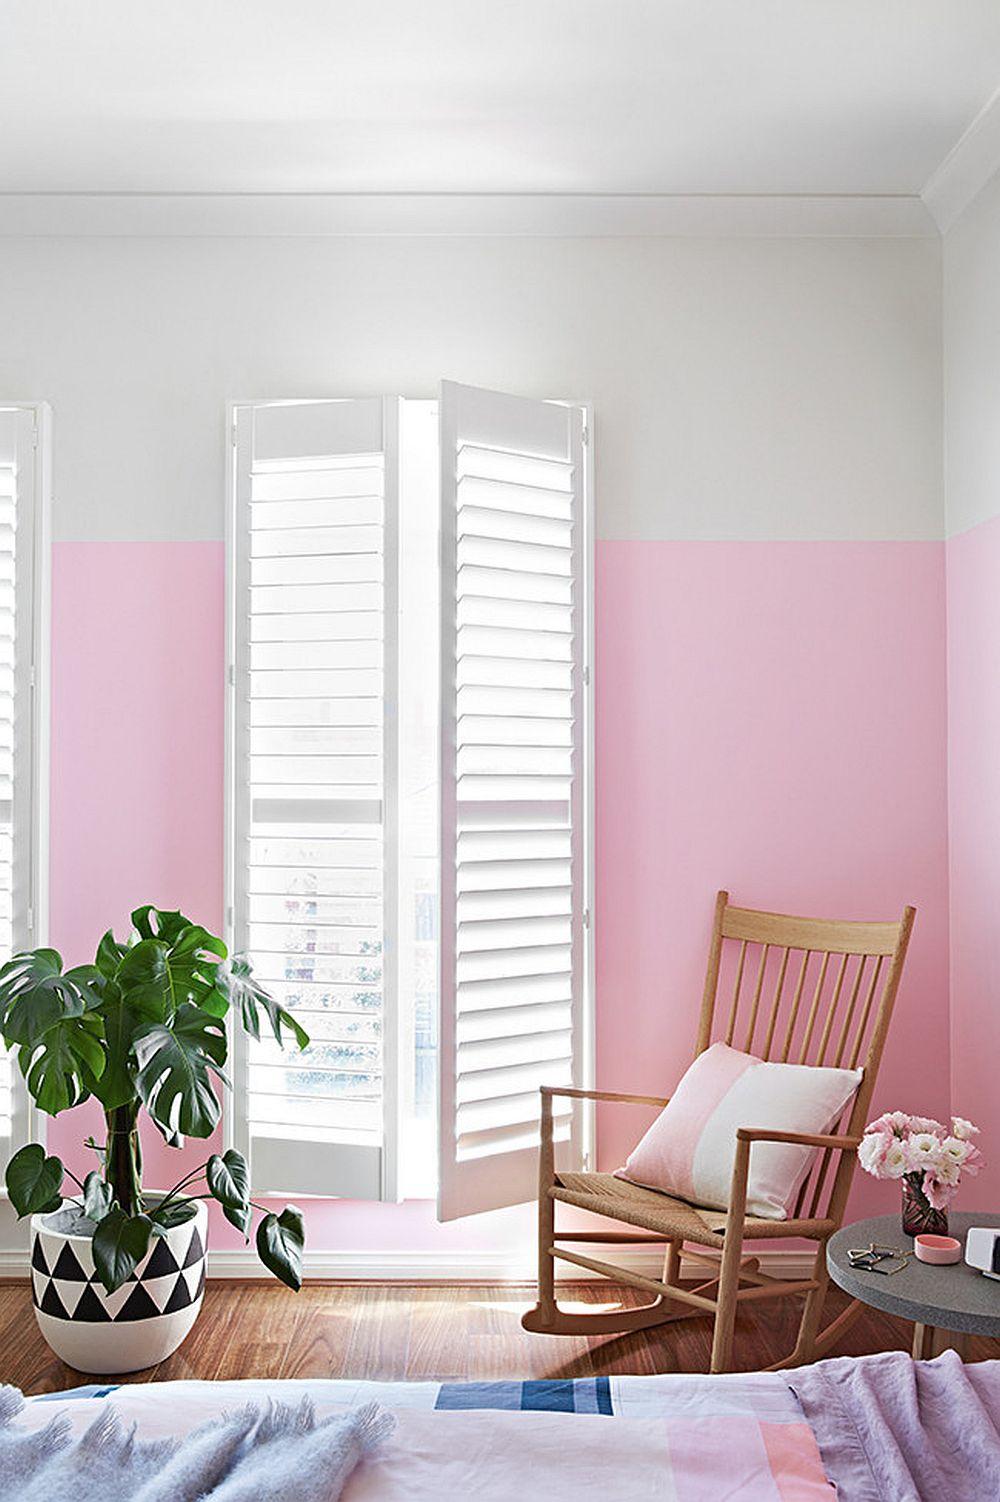 adelaparvu.com despre acelasi dormitor 2 variante de decorare, stilist Julia Green, Foto Armelle Habib  (5)